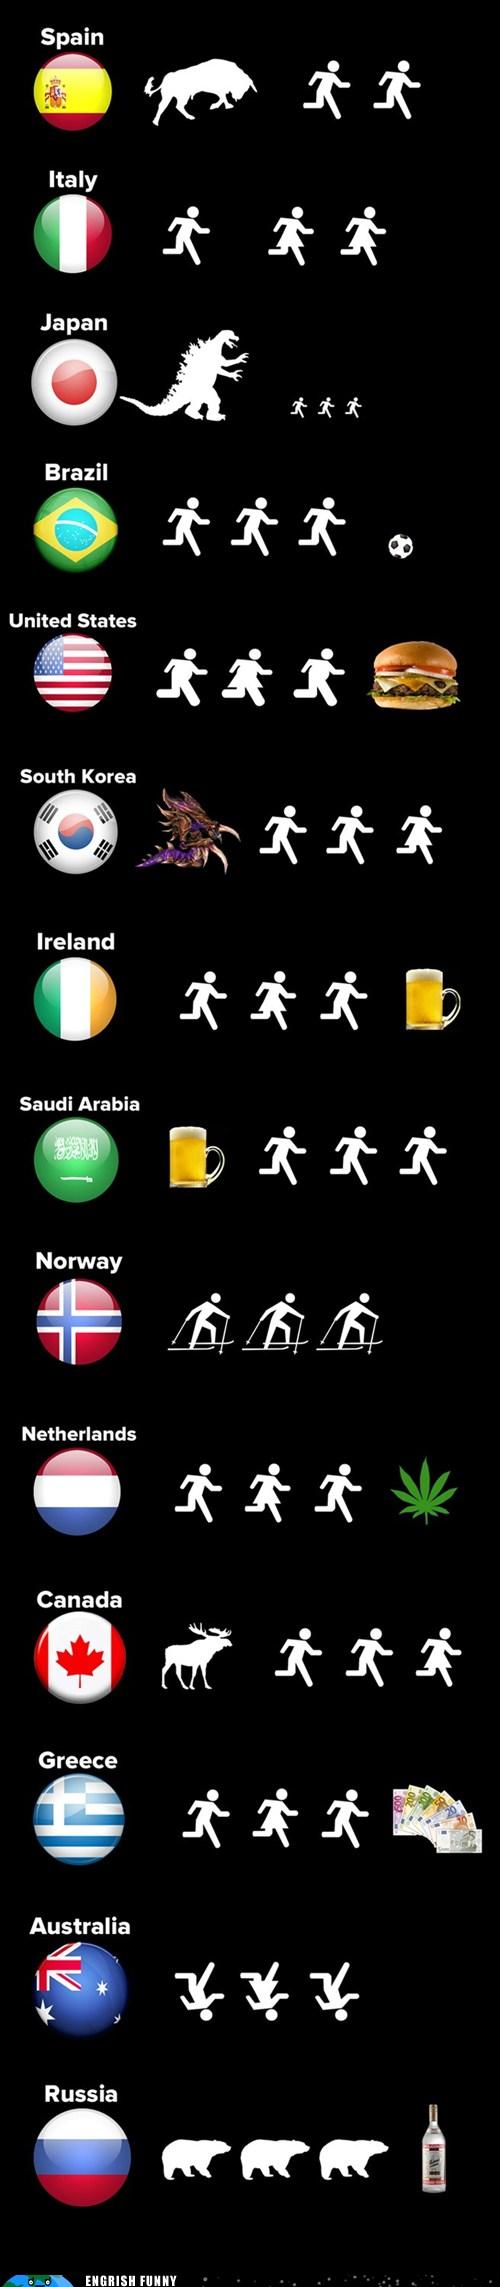 engrish-funny-engrish-funny-running-around-the-world